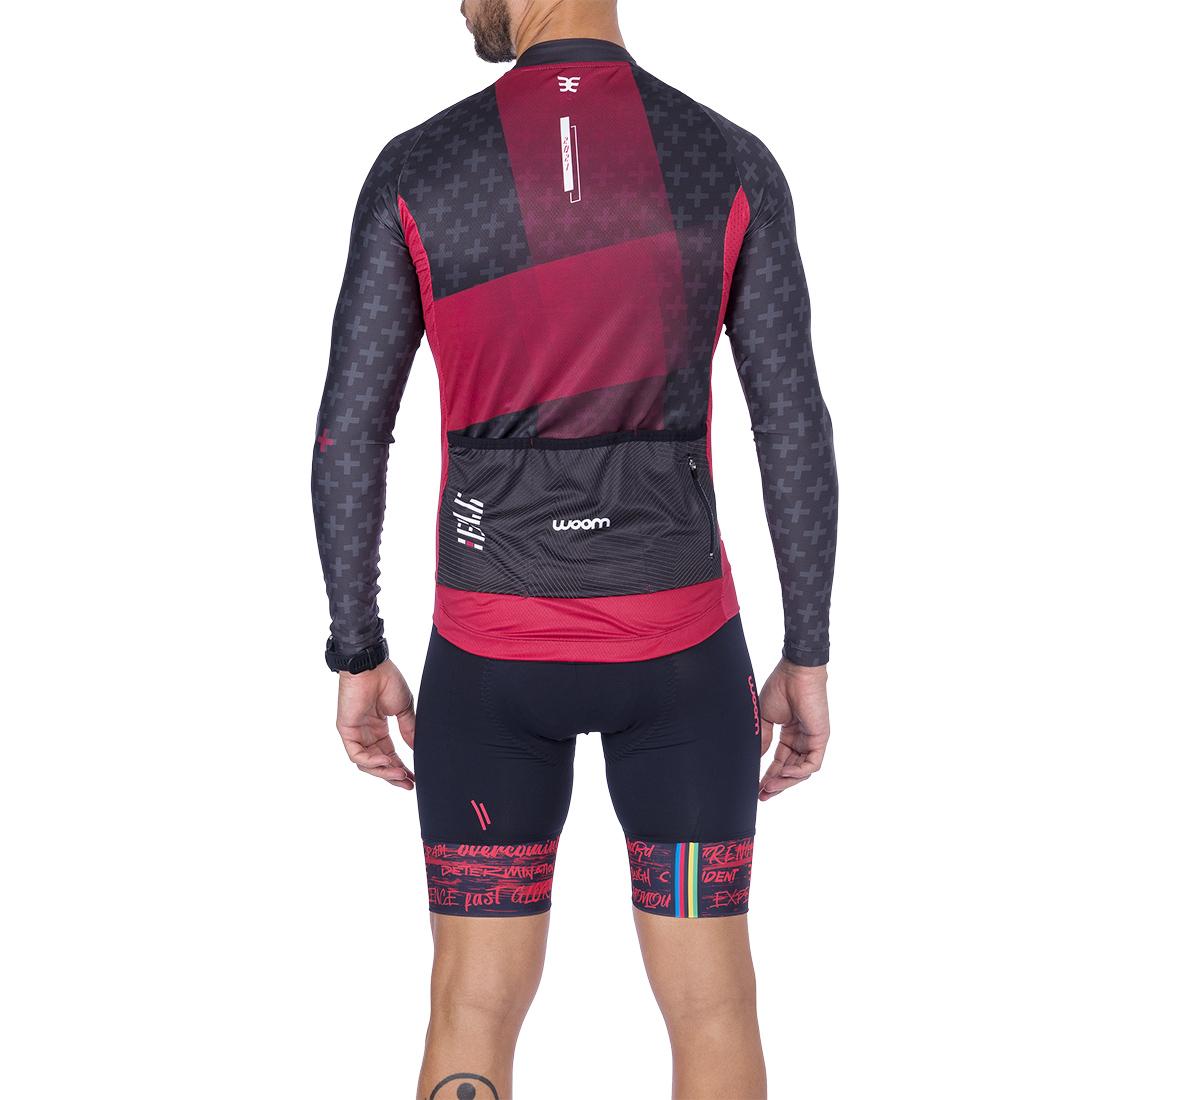 Camisa Ciclismo ML Supreme Zurique Masc - 2021